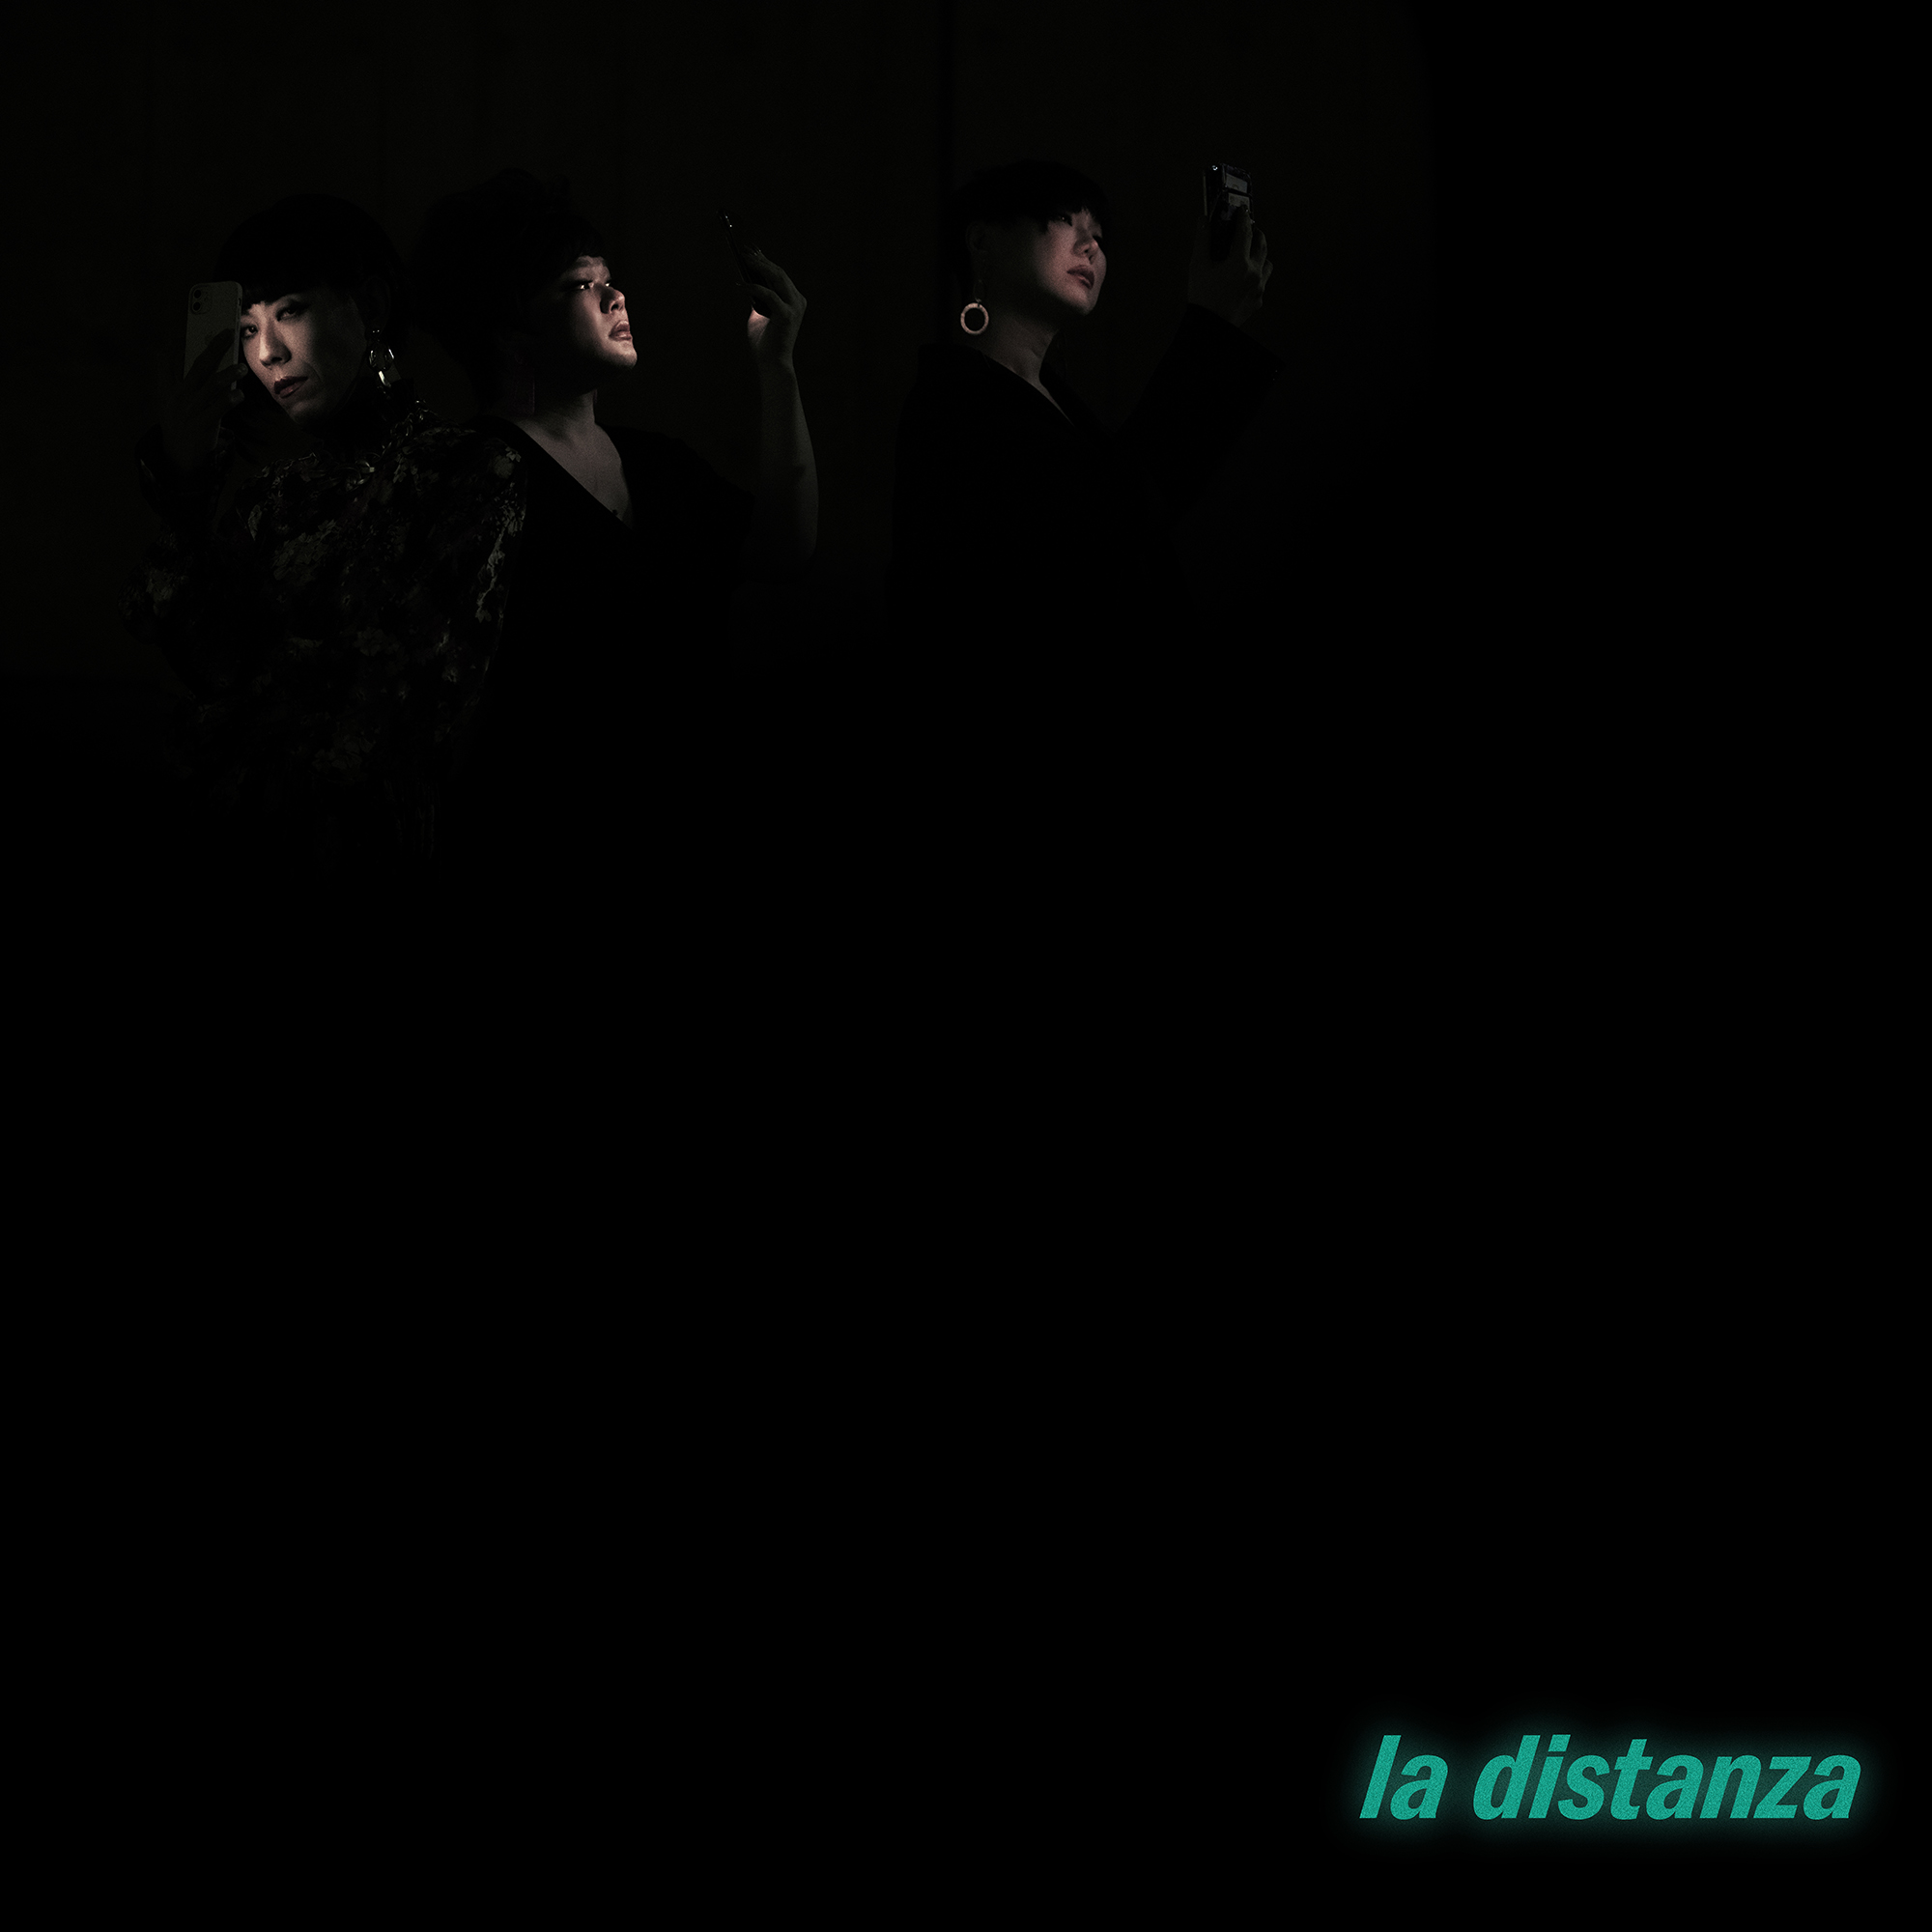 【NEW RELEASE】配信シングル『 la distanza』10月13日配信開始!